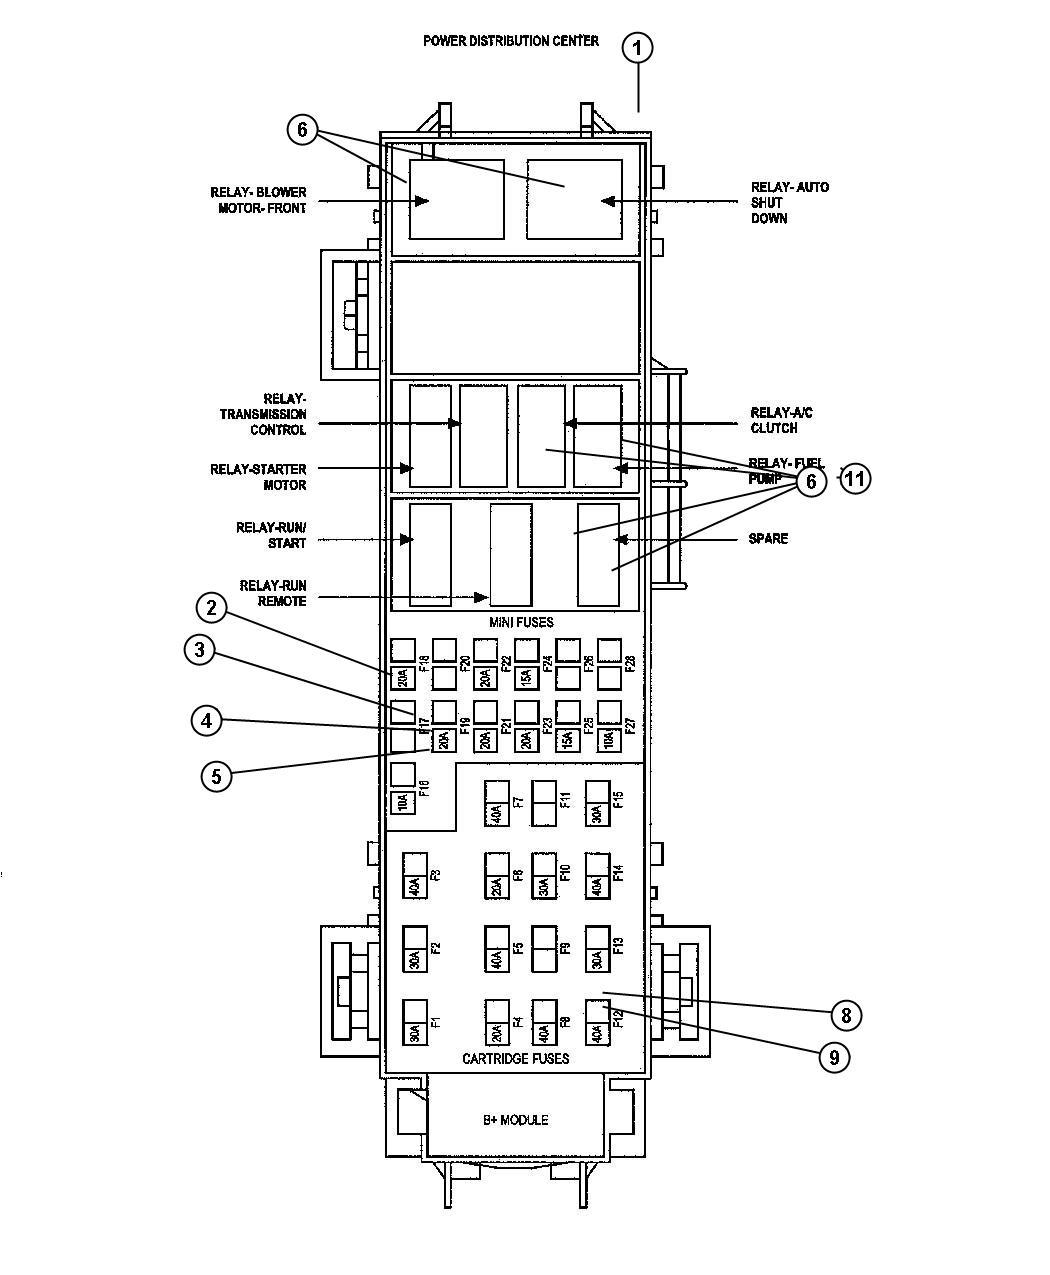 2005 polaris ranger fuse box location